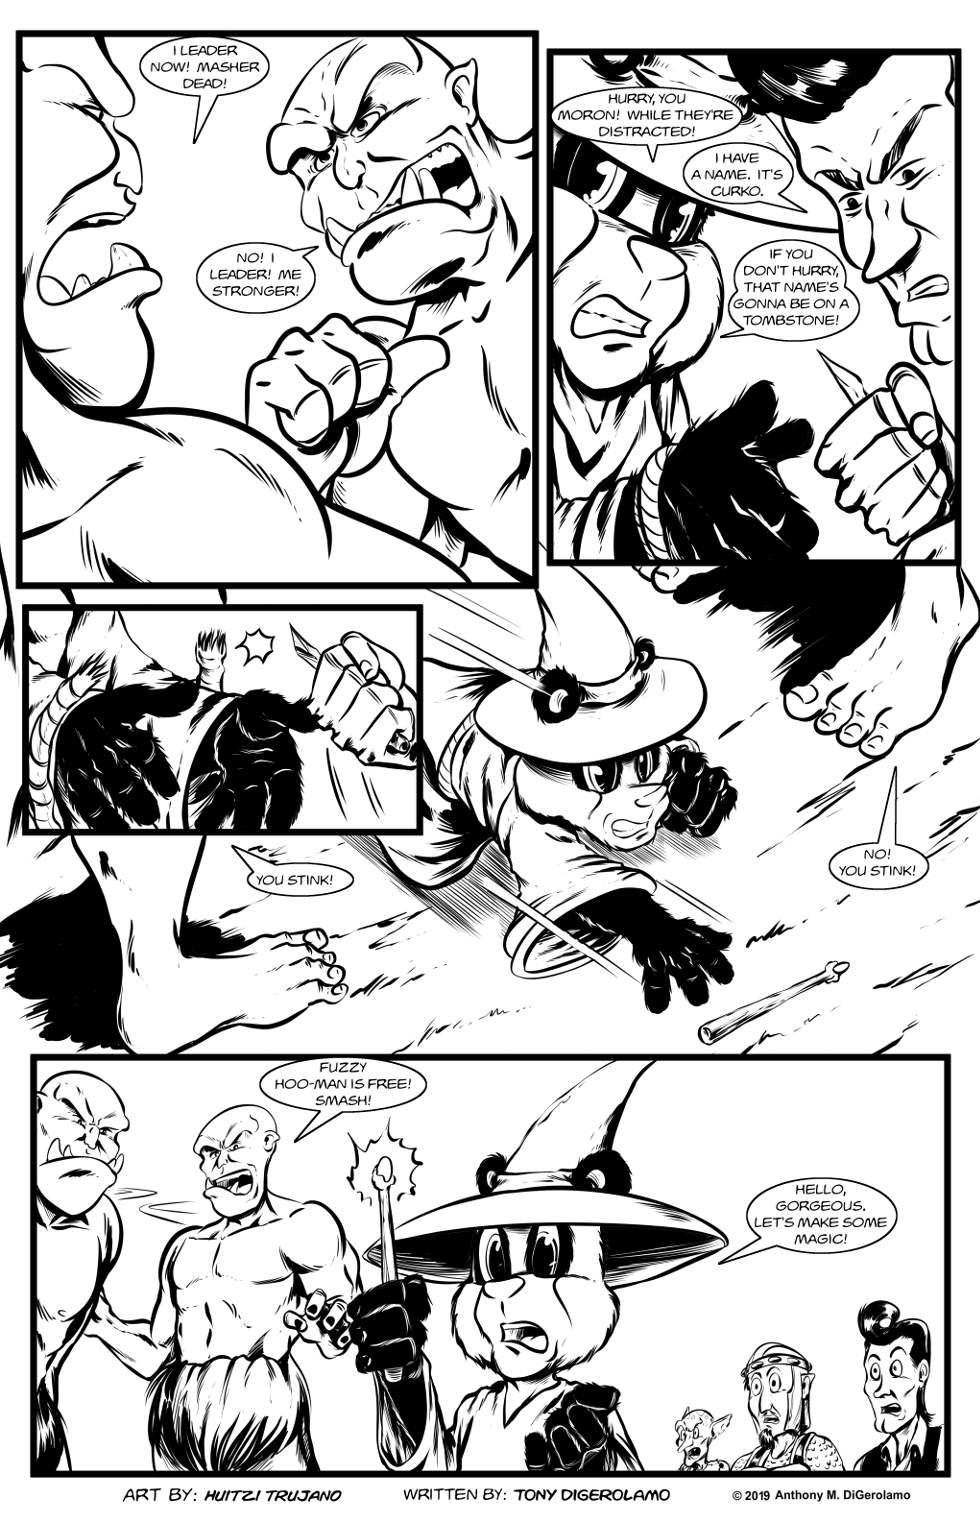 Pandamodium:  The Orc Distraction